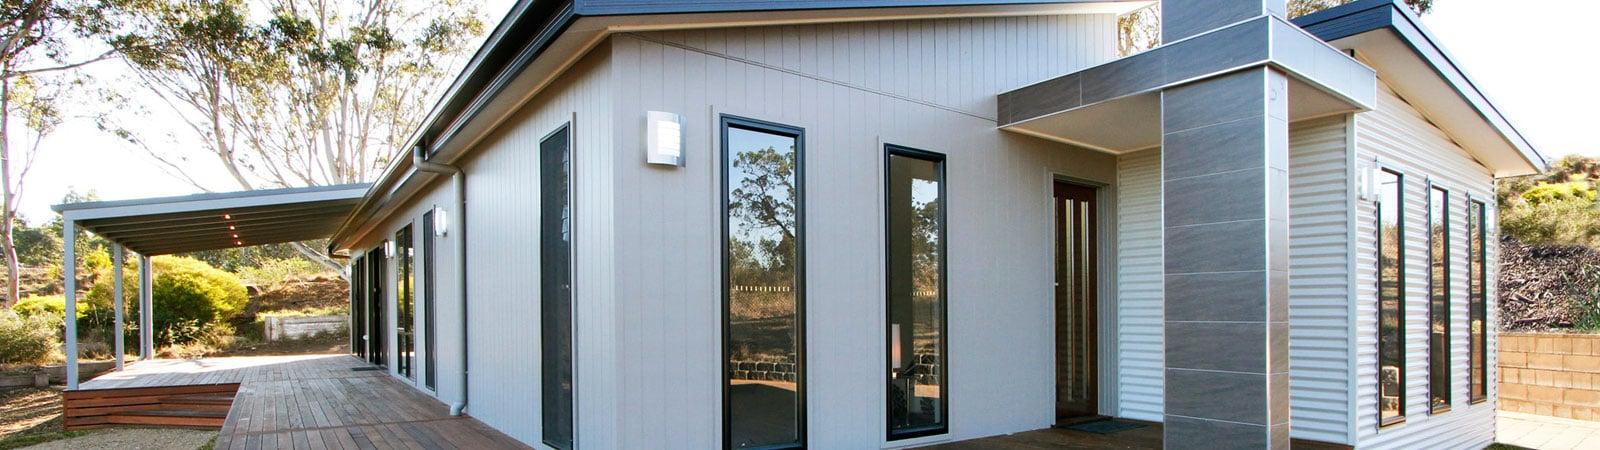 Kit homes vs modular homes - Modular home vs manufactured home ...